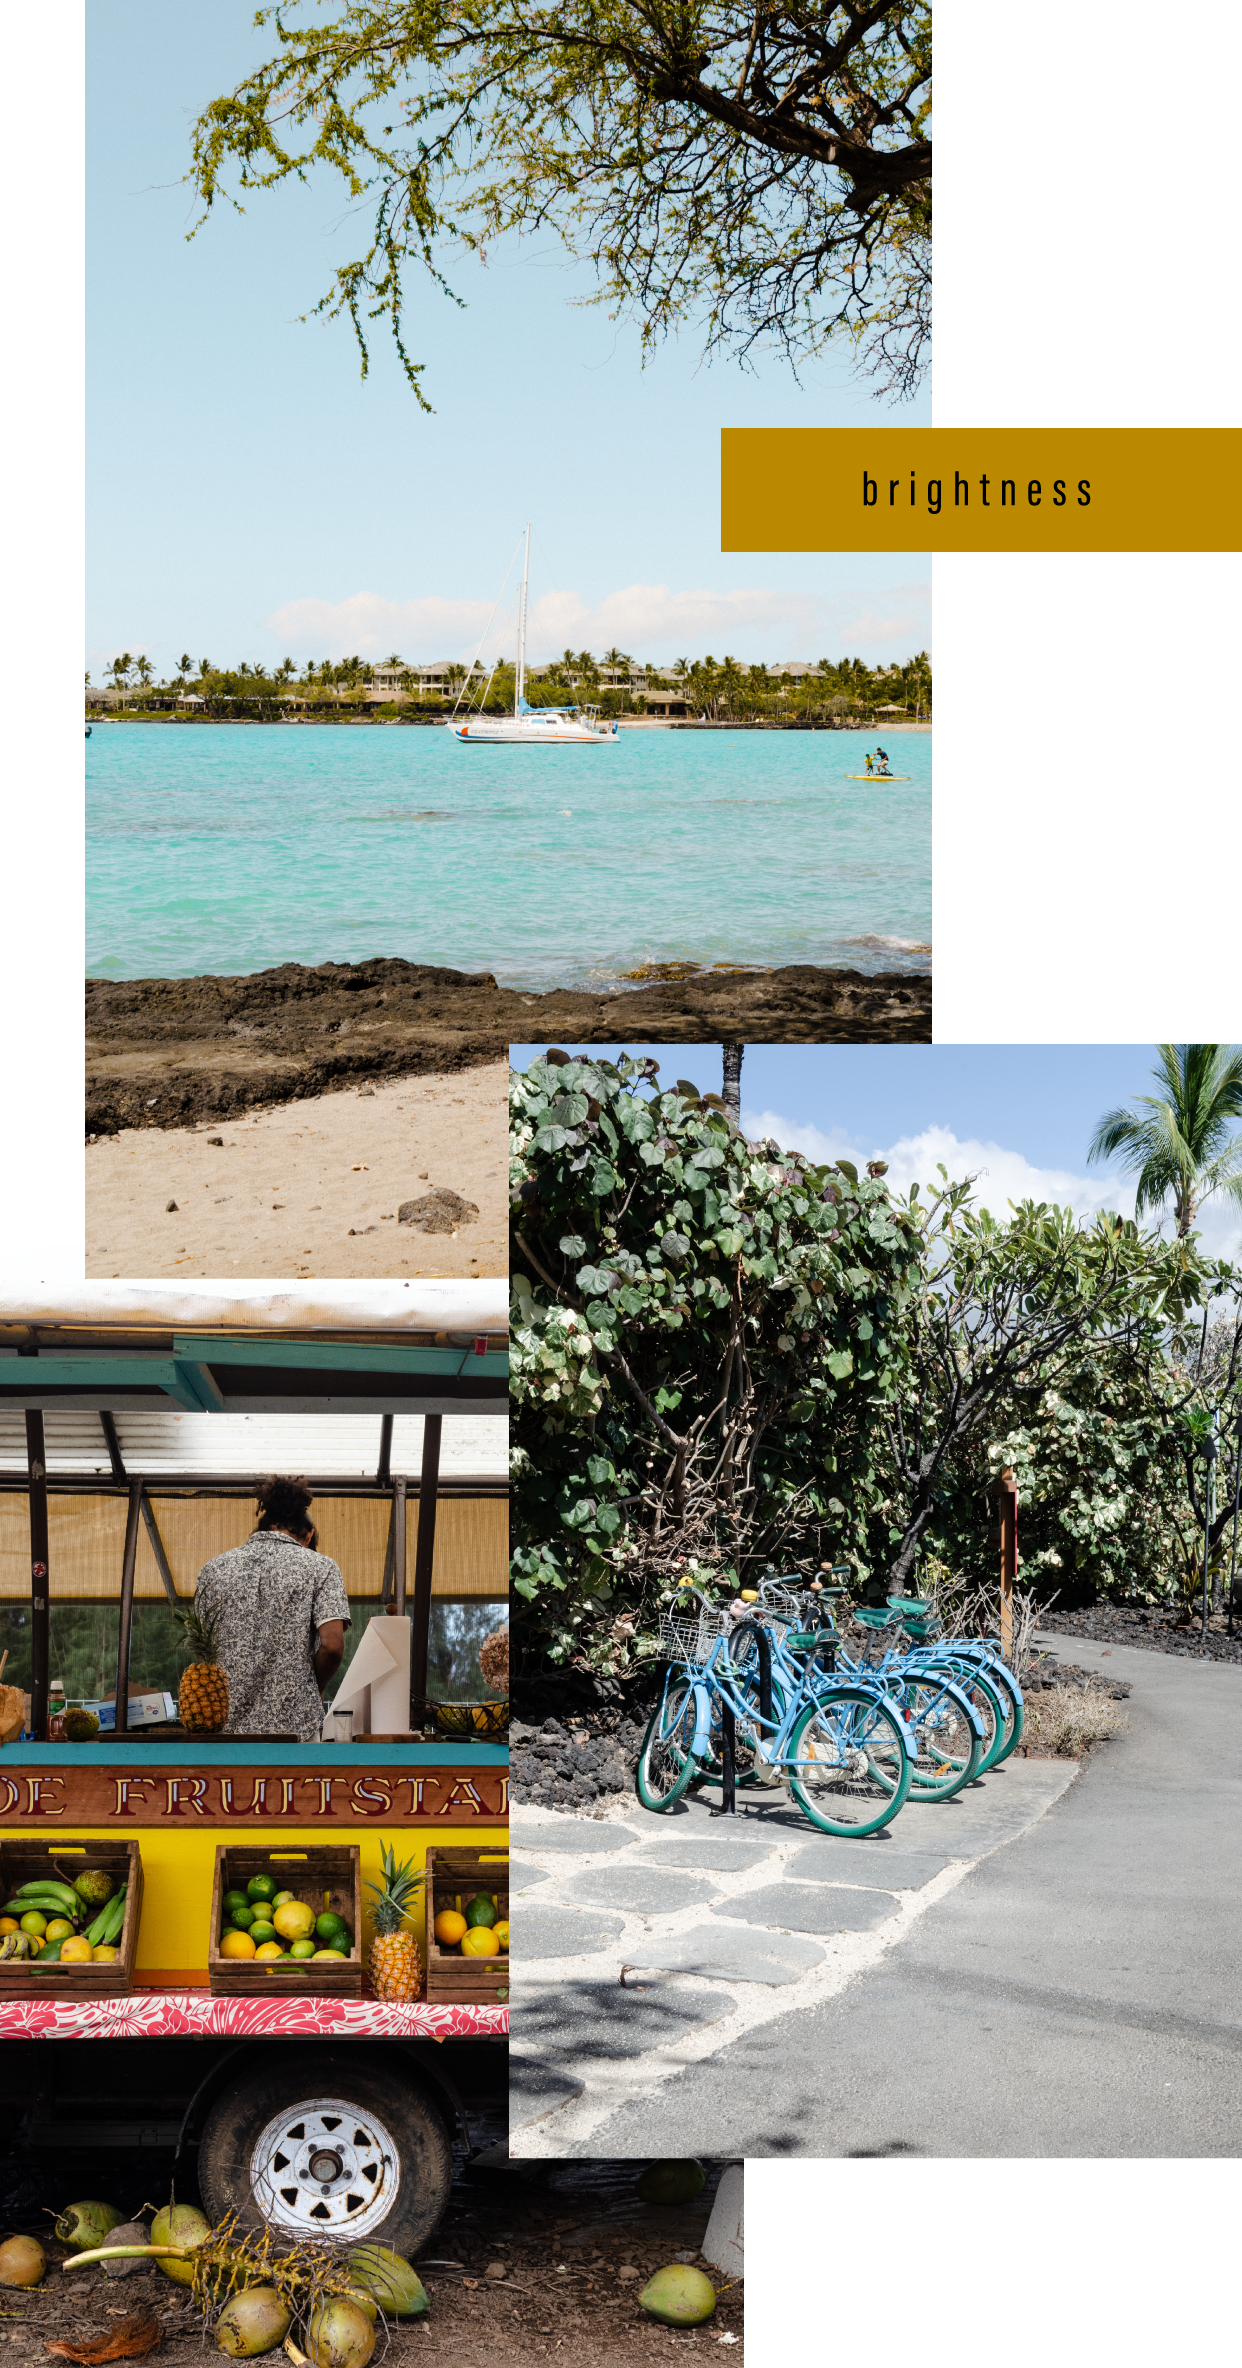 Bottega-x-Hawaii_Brightness.png